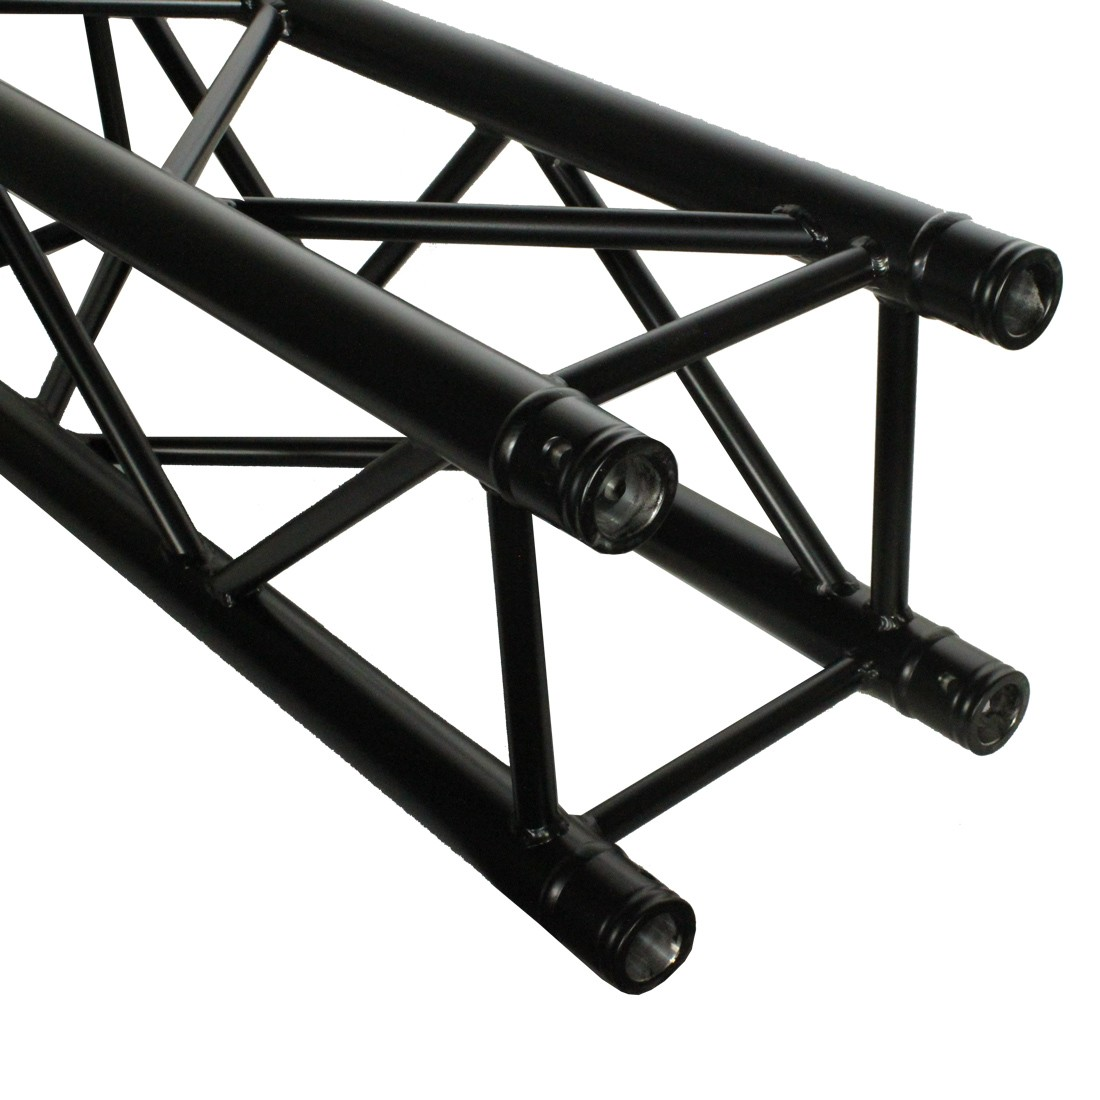 DT 34/2-150 matt black